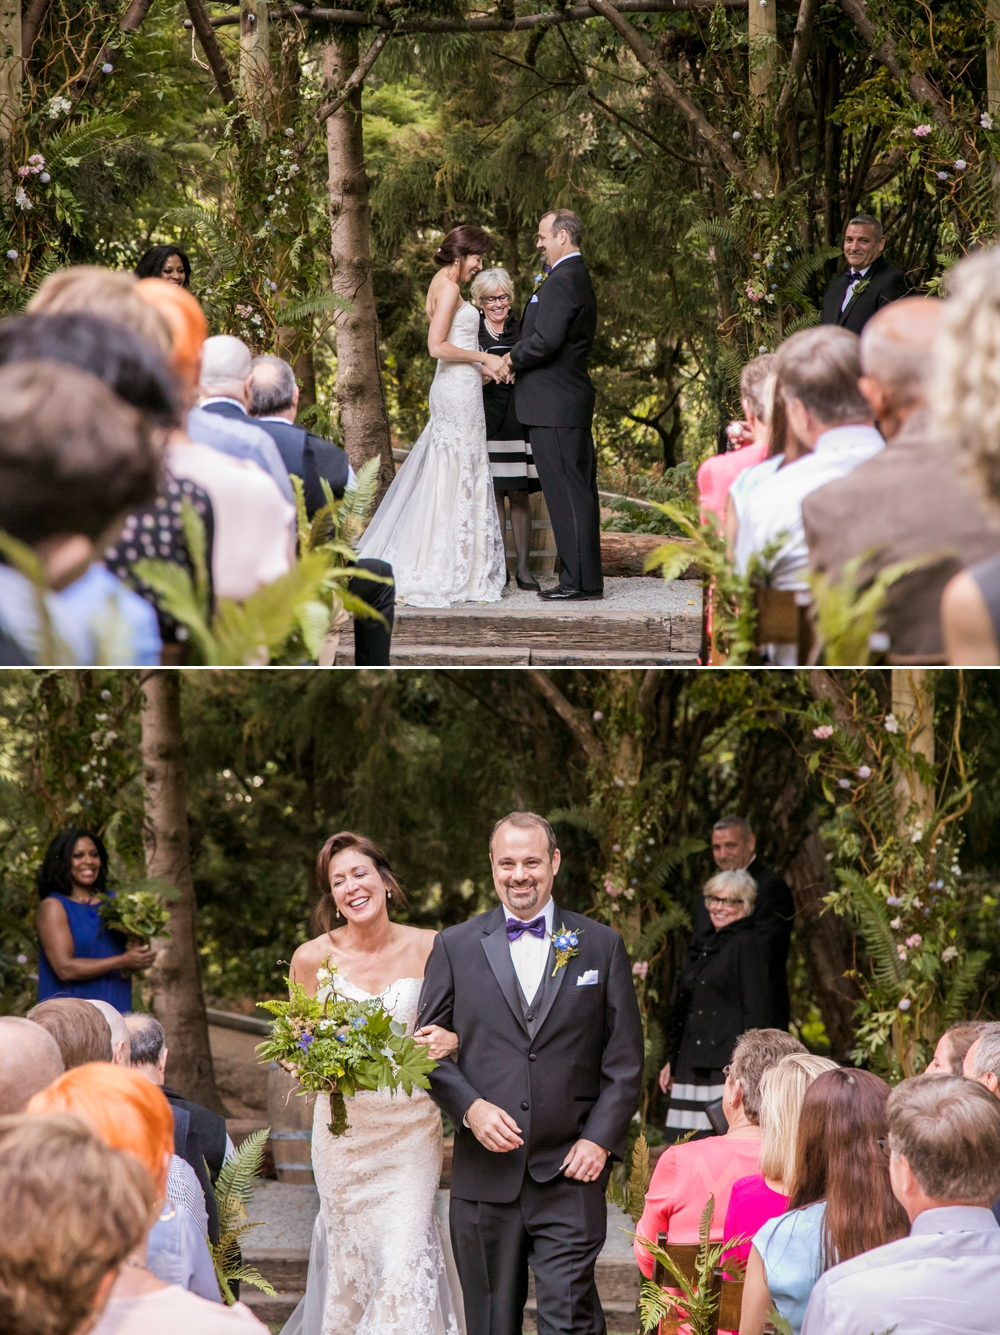 wedding-ceremony-at-jm-cellars